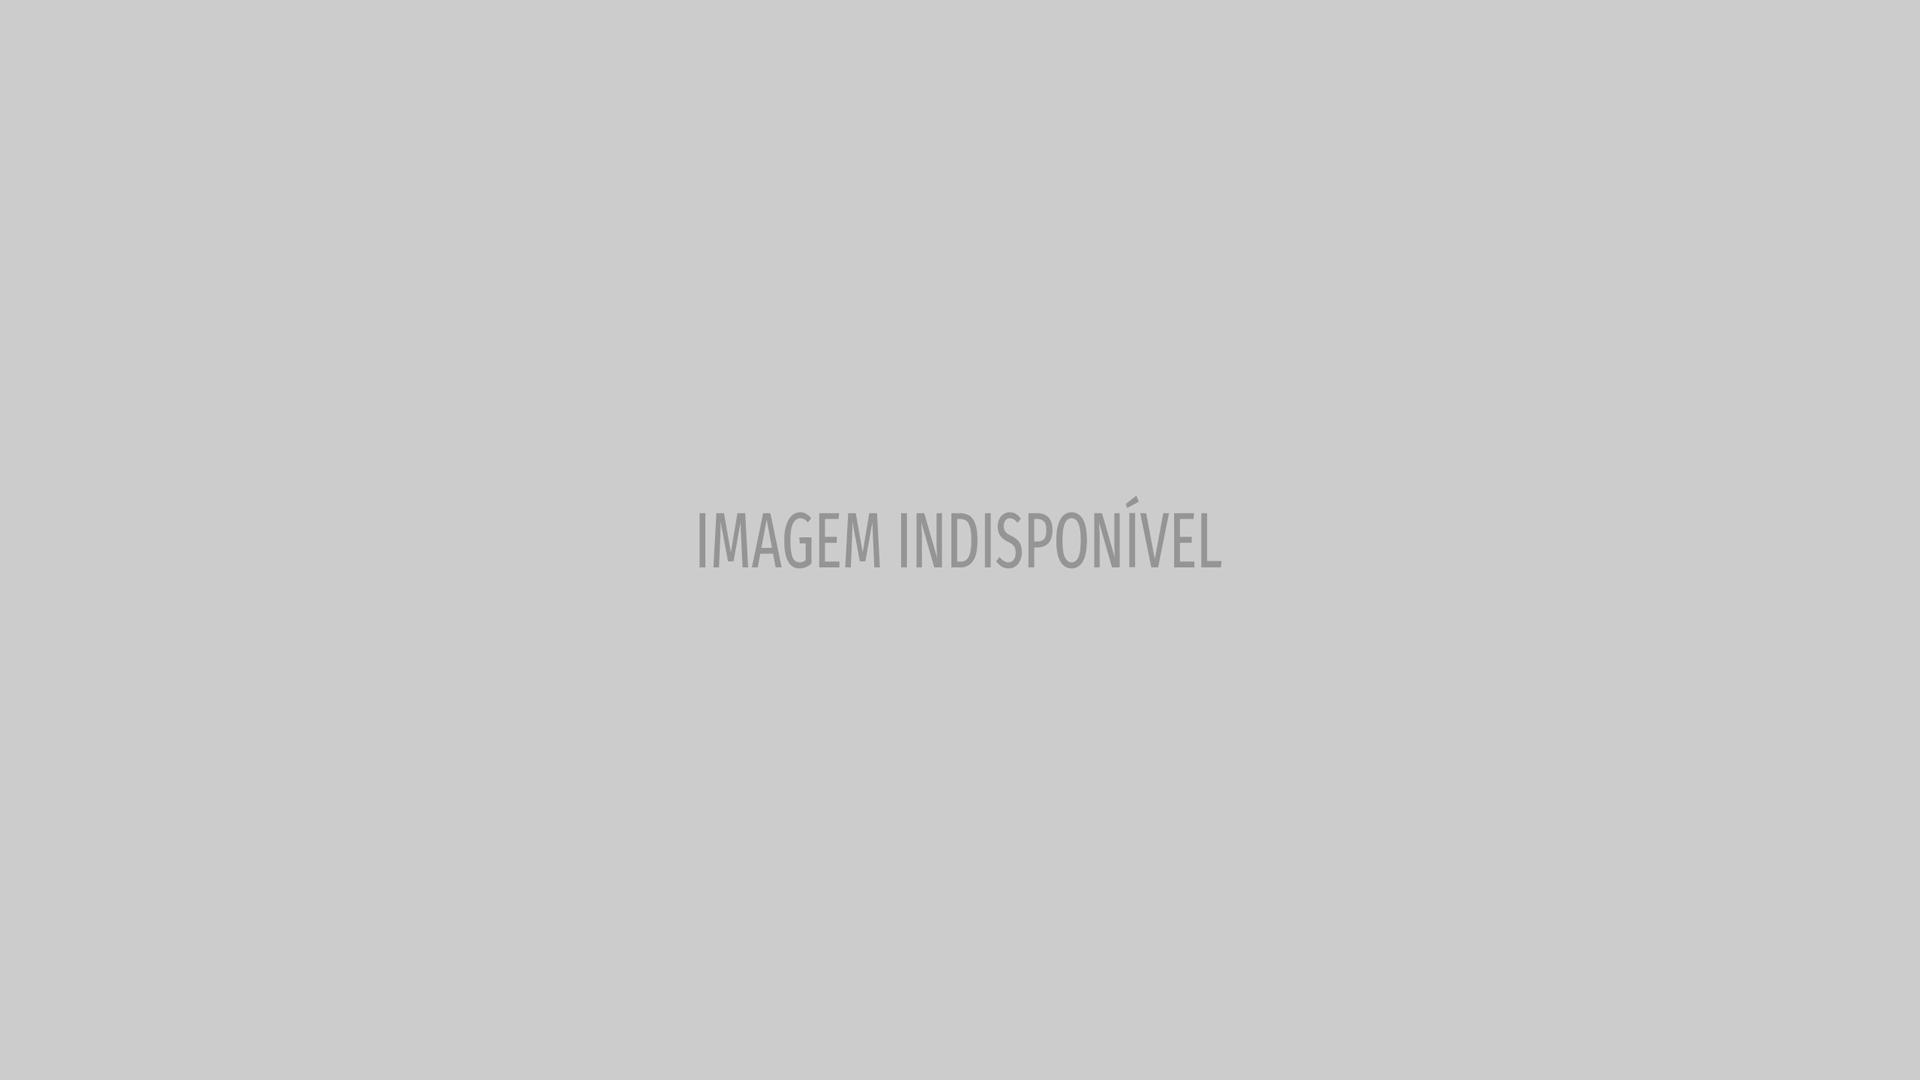 Taís Araújo será entrevistada no Roda Viva no Dia Internacional da Mulher